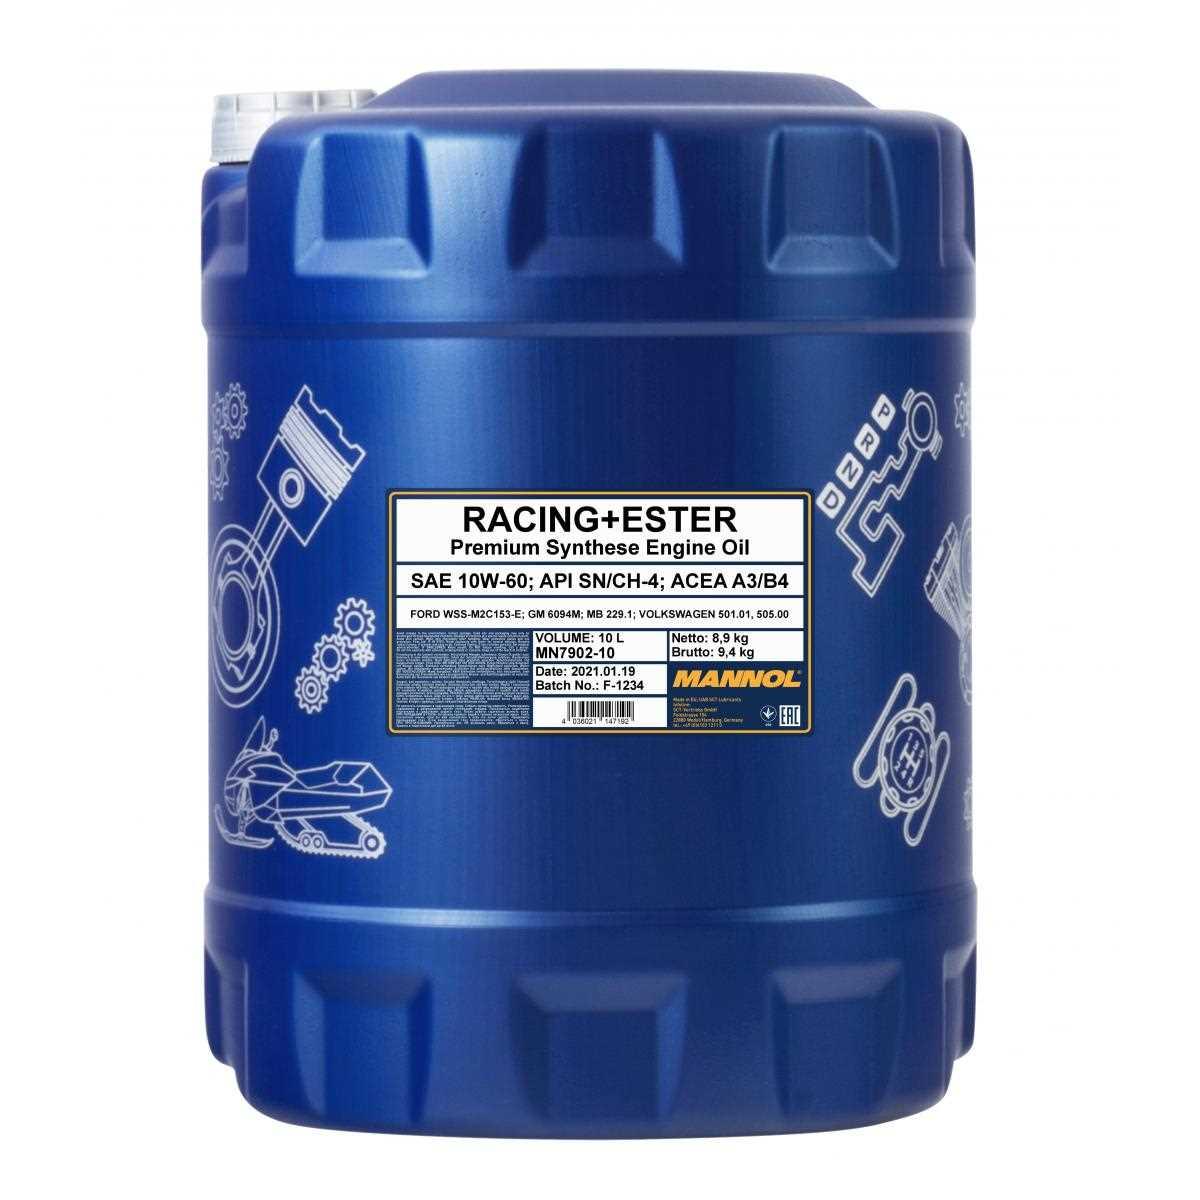 Aceite-del-motor-aceite-5w40-10w40-15w40-5w30-10w60-1l-4l-5l-7l-10l-20l miniatura 67